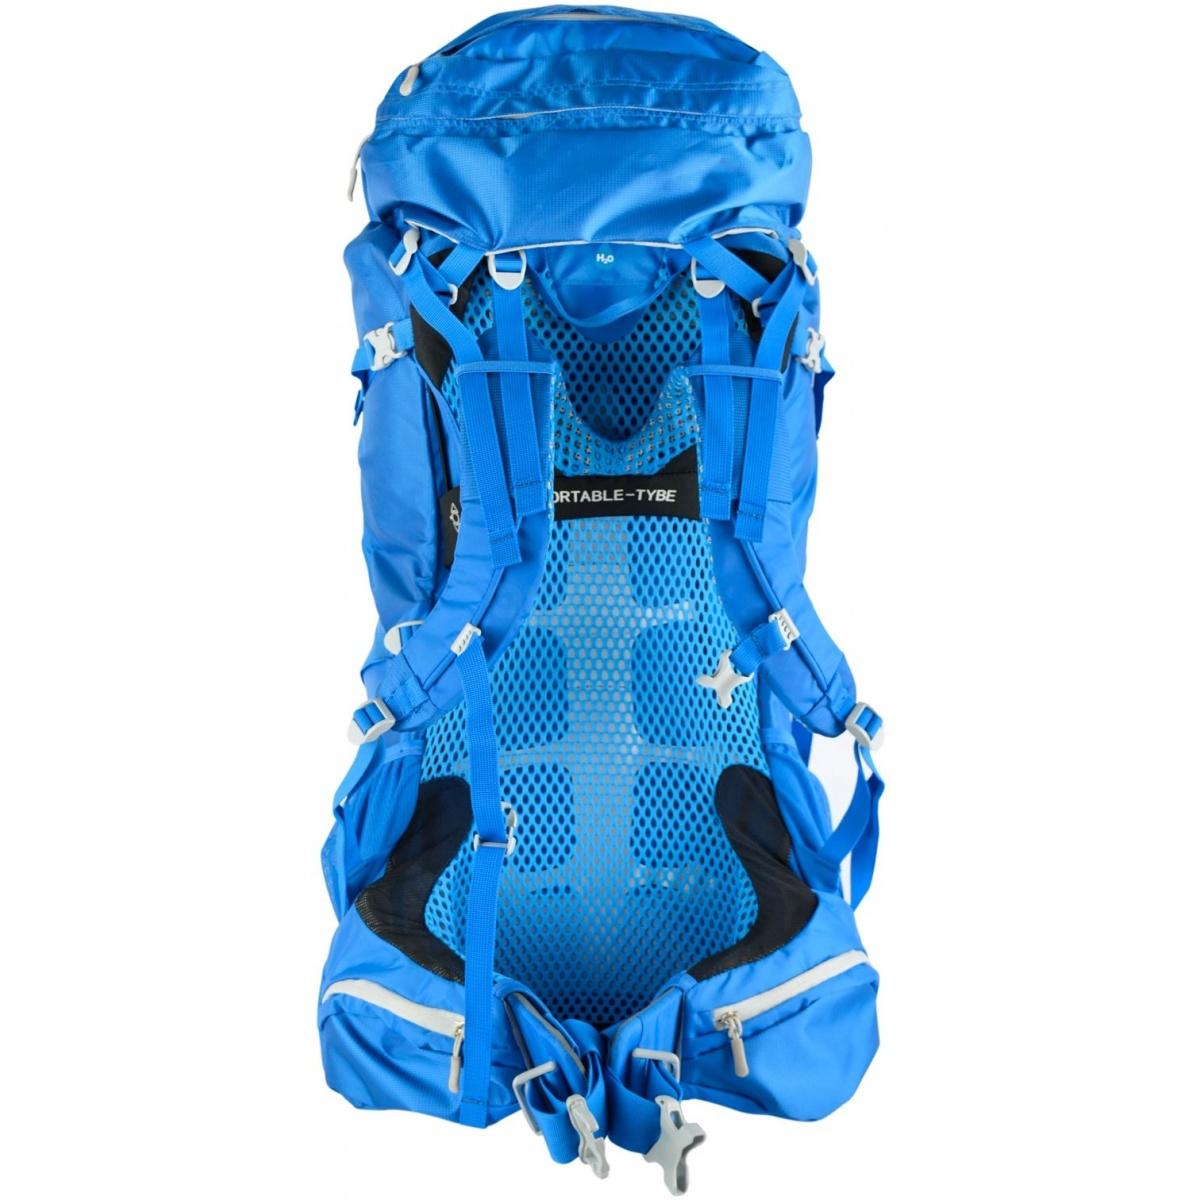 Batoh Expedice - Razor 70l – modrá  09dea47a02